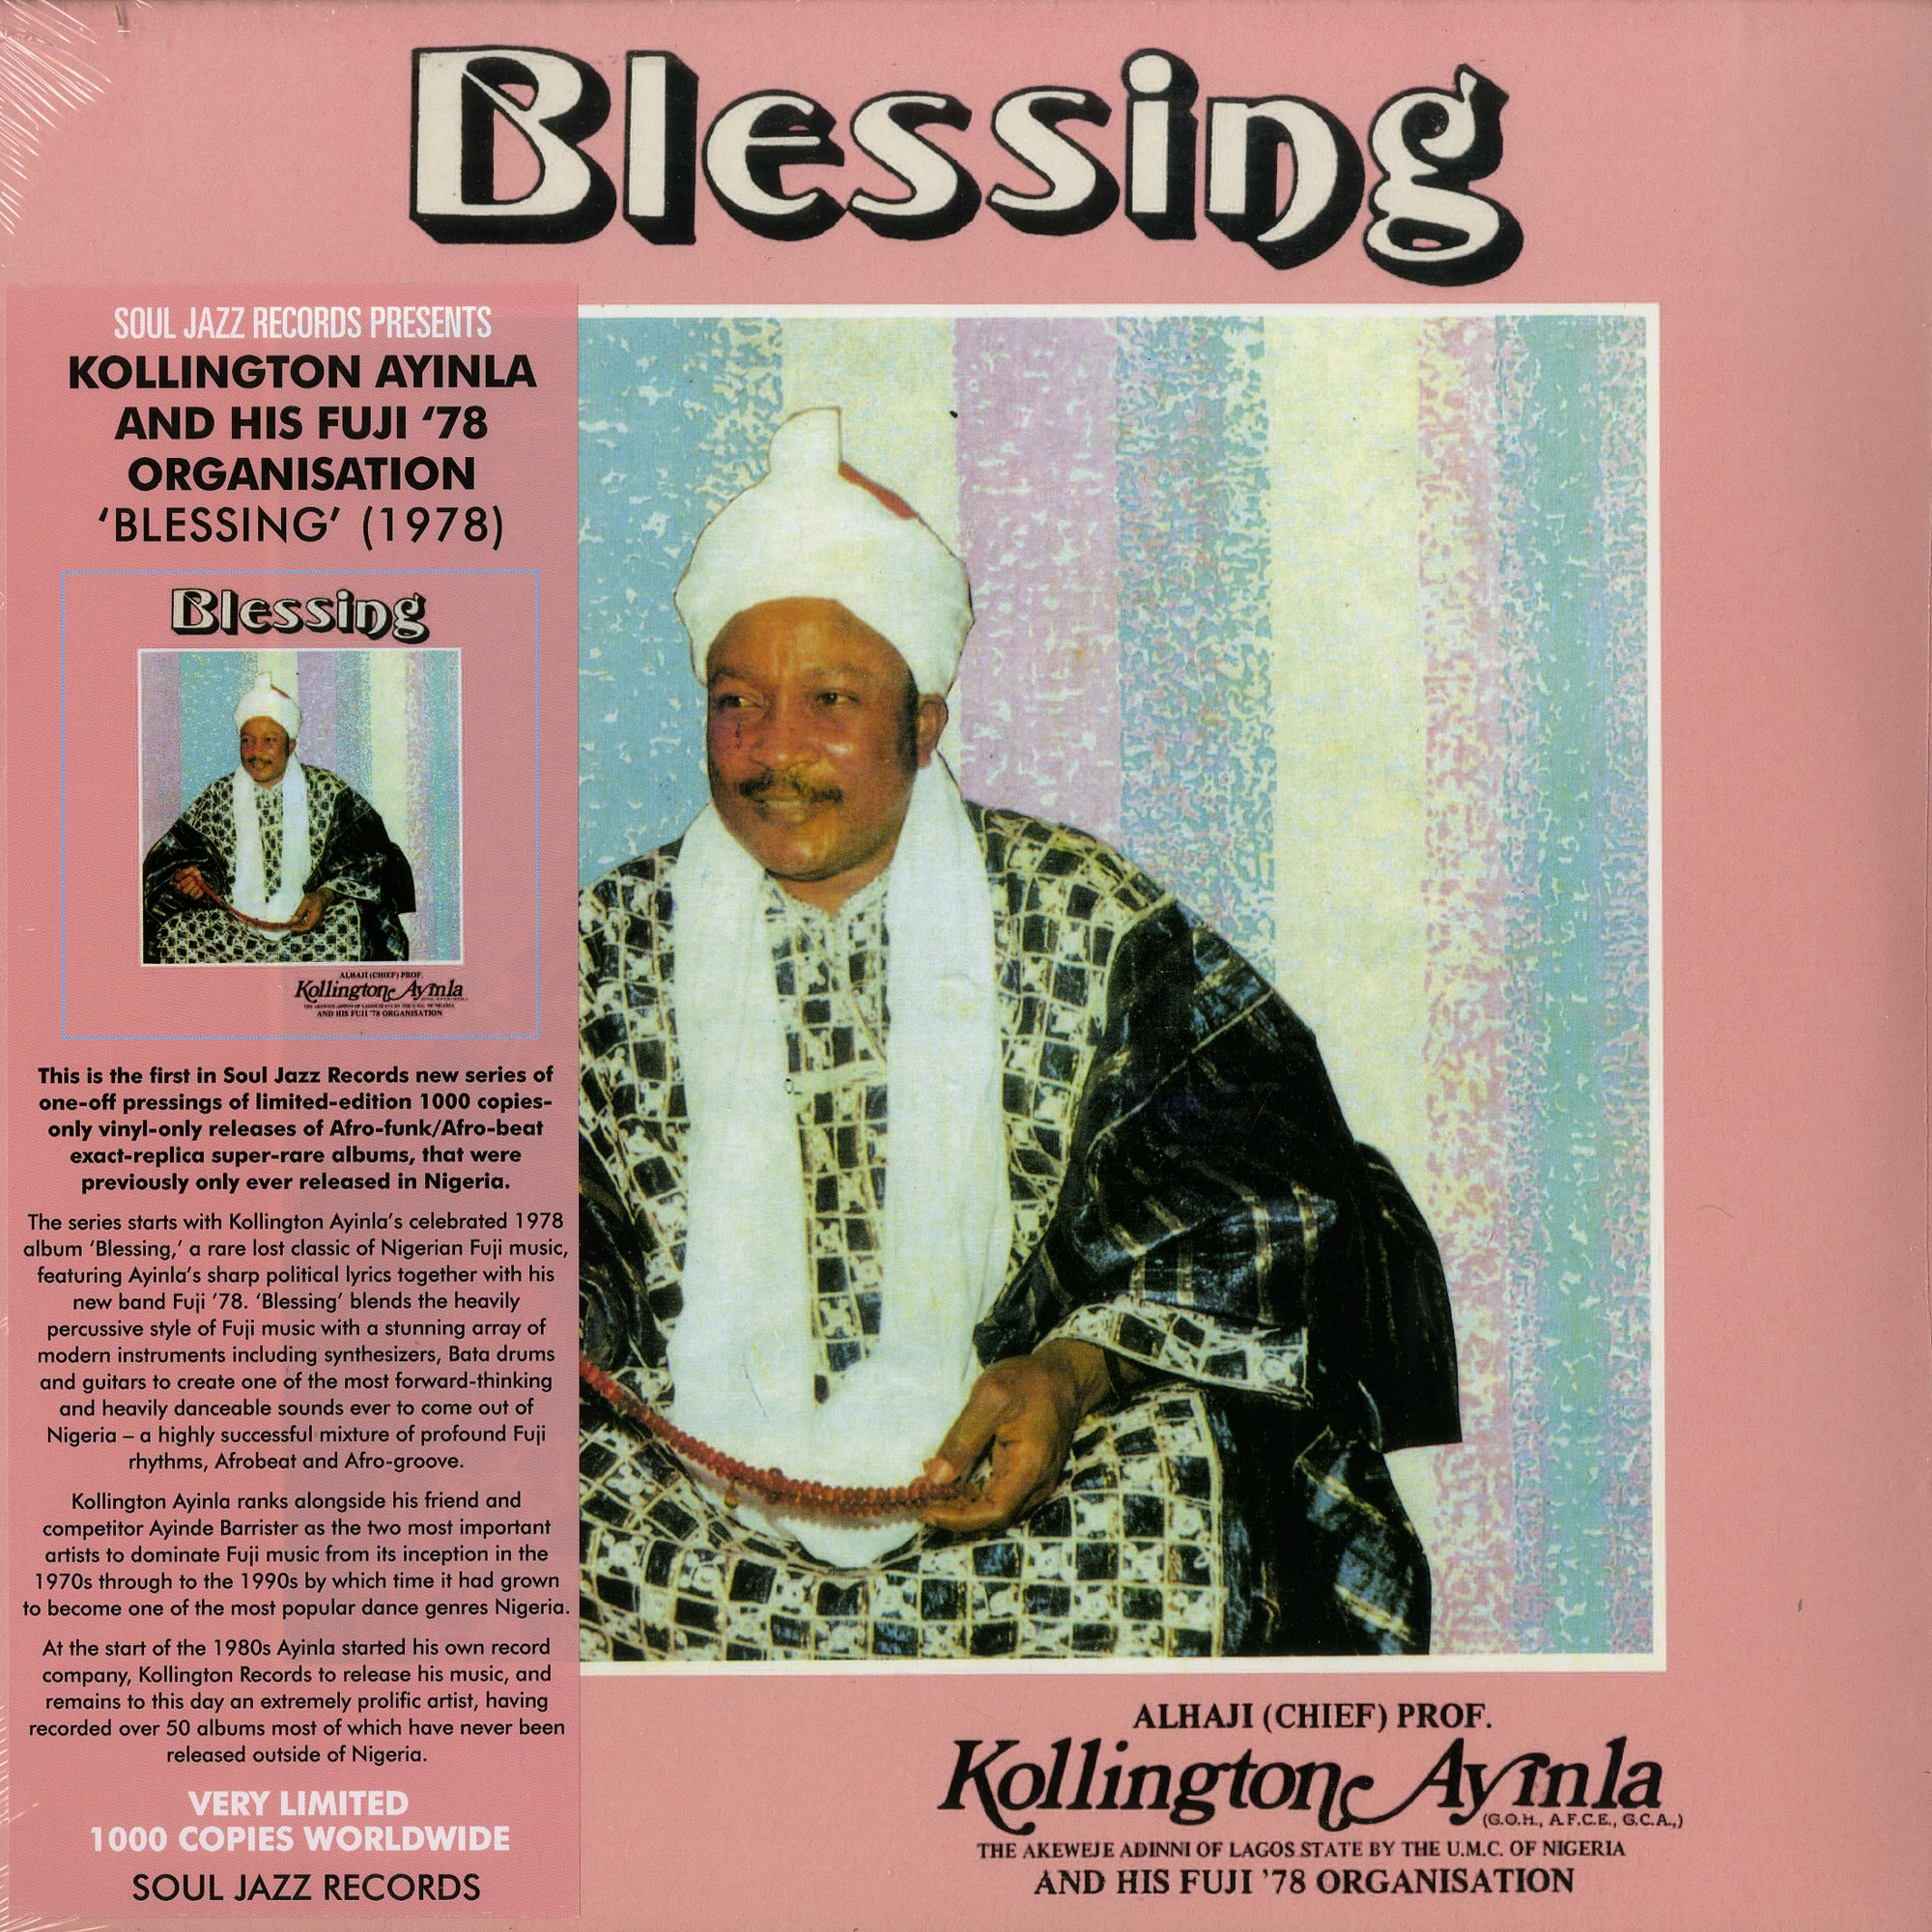 Kollington Ayinla And His Fuji 78 Organisation - BLESSING